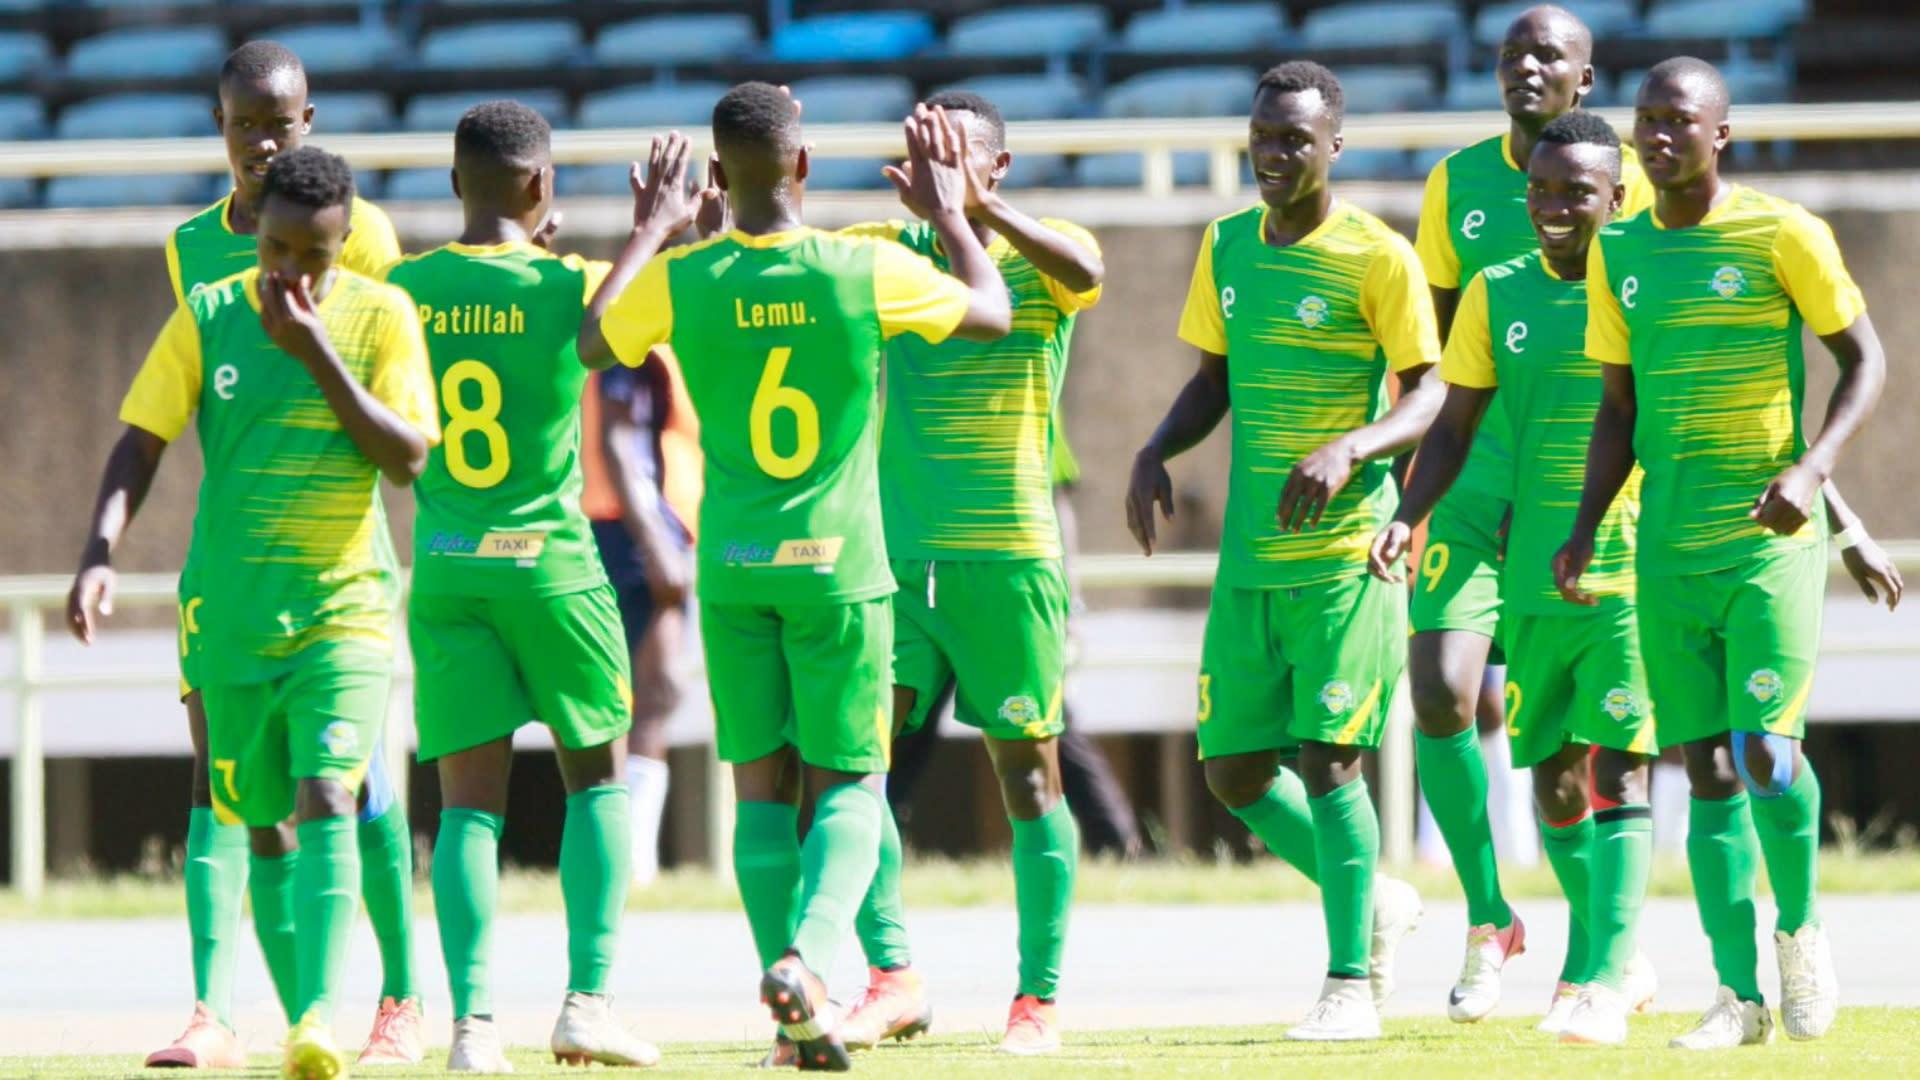 Kariobangi Sharks to face Yanga SC in friendly match in Dar es Salaam